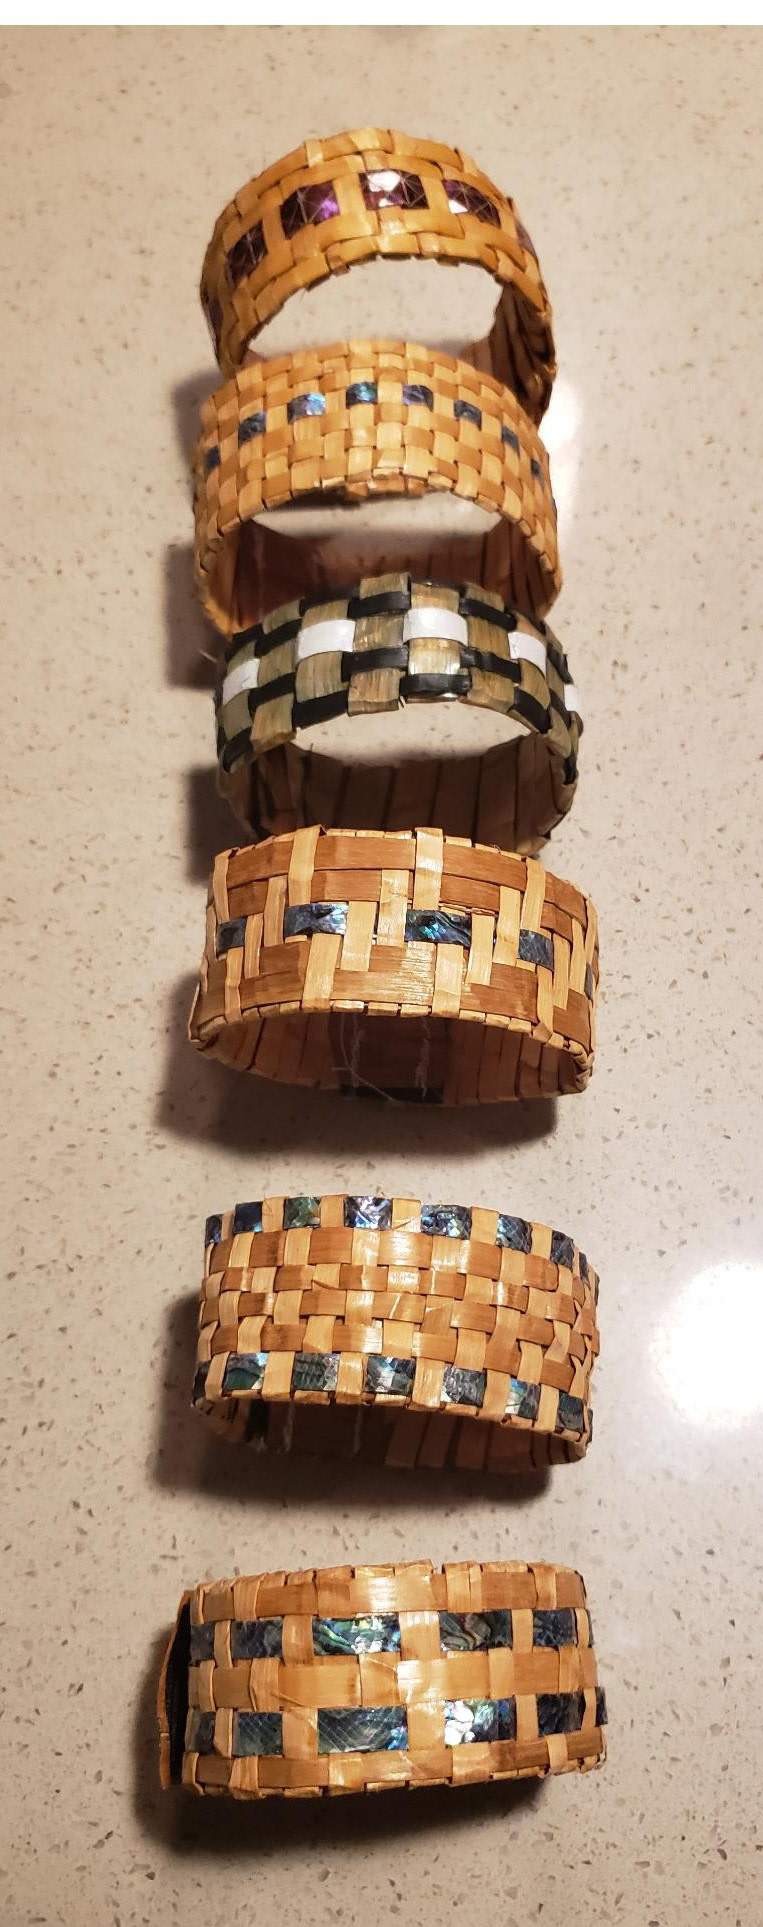 Cedar Bracelet with Abalone inlay- by C. Chapman-4